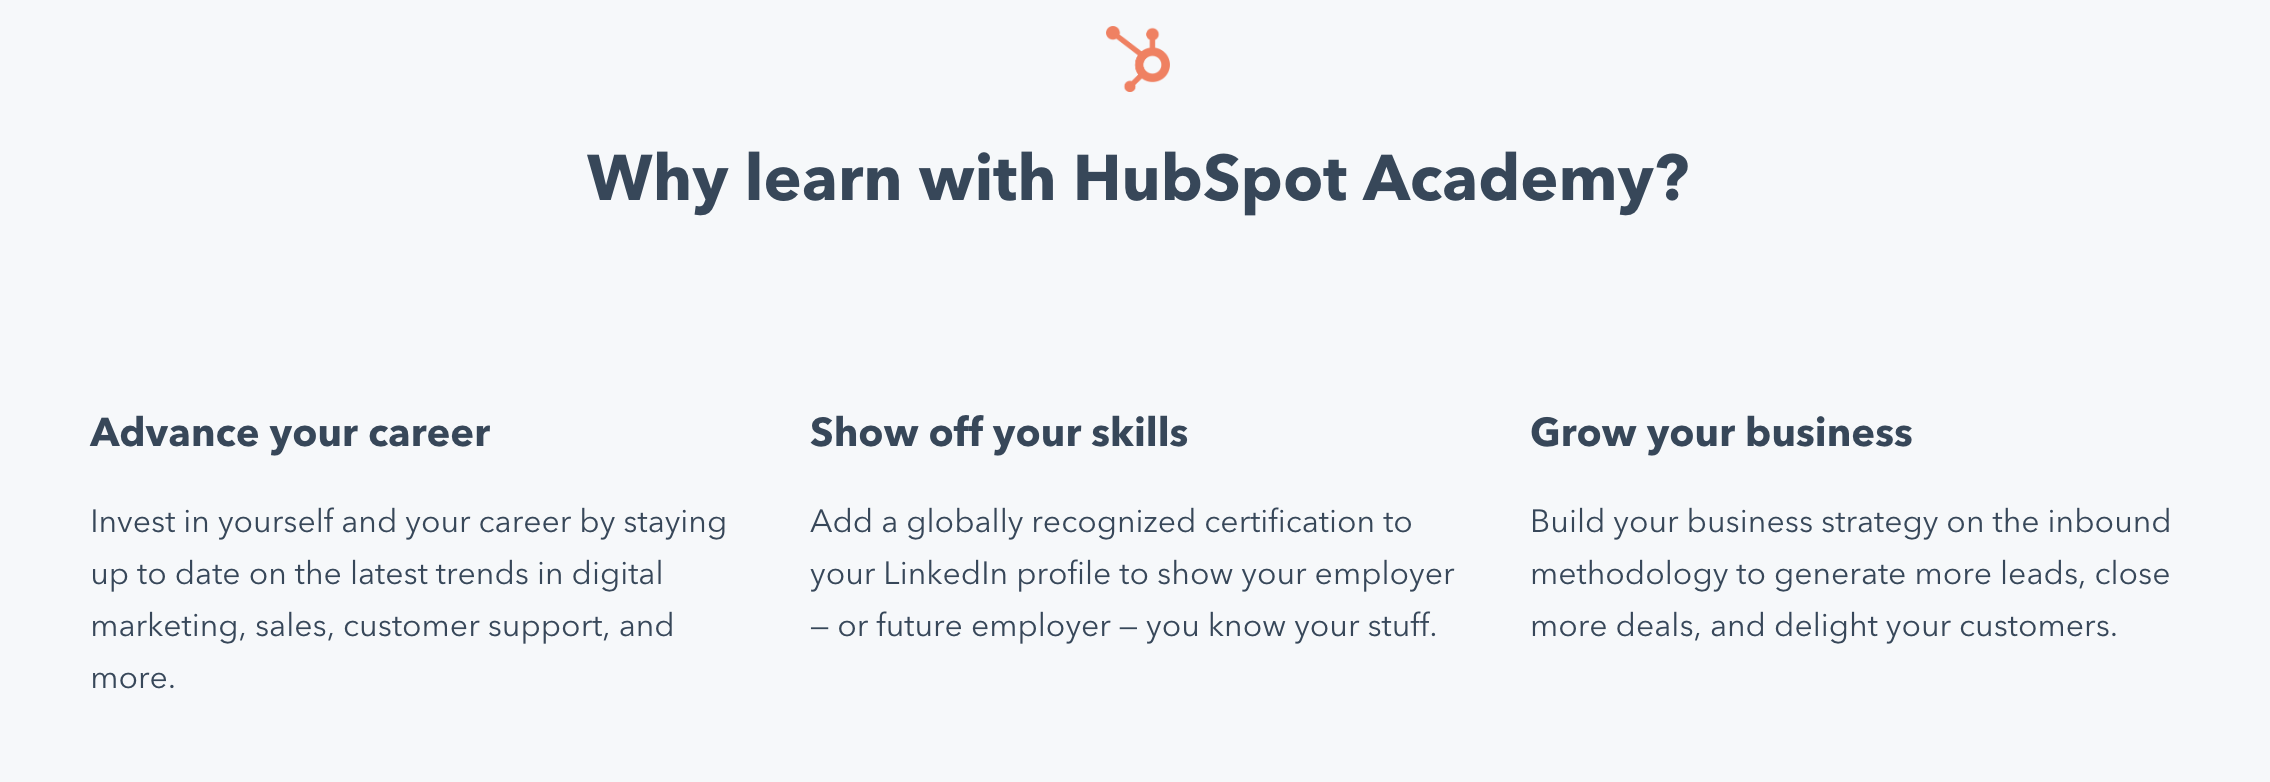 Why learn HubSpot Screenshot